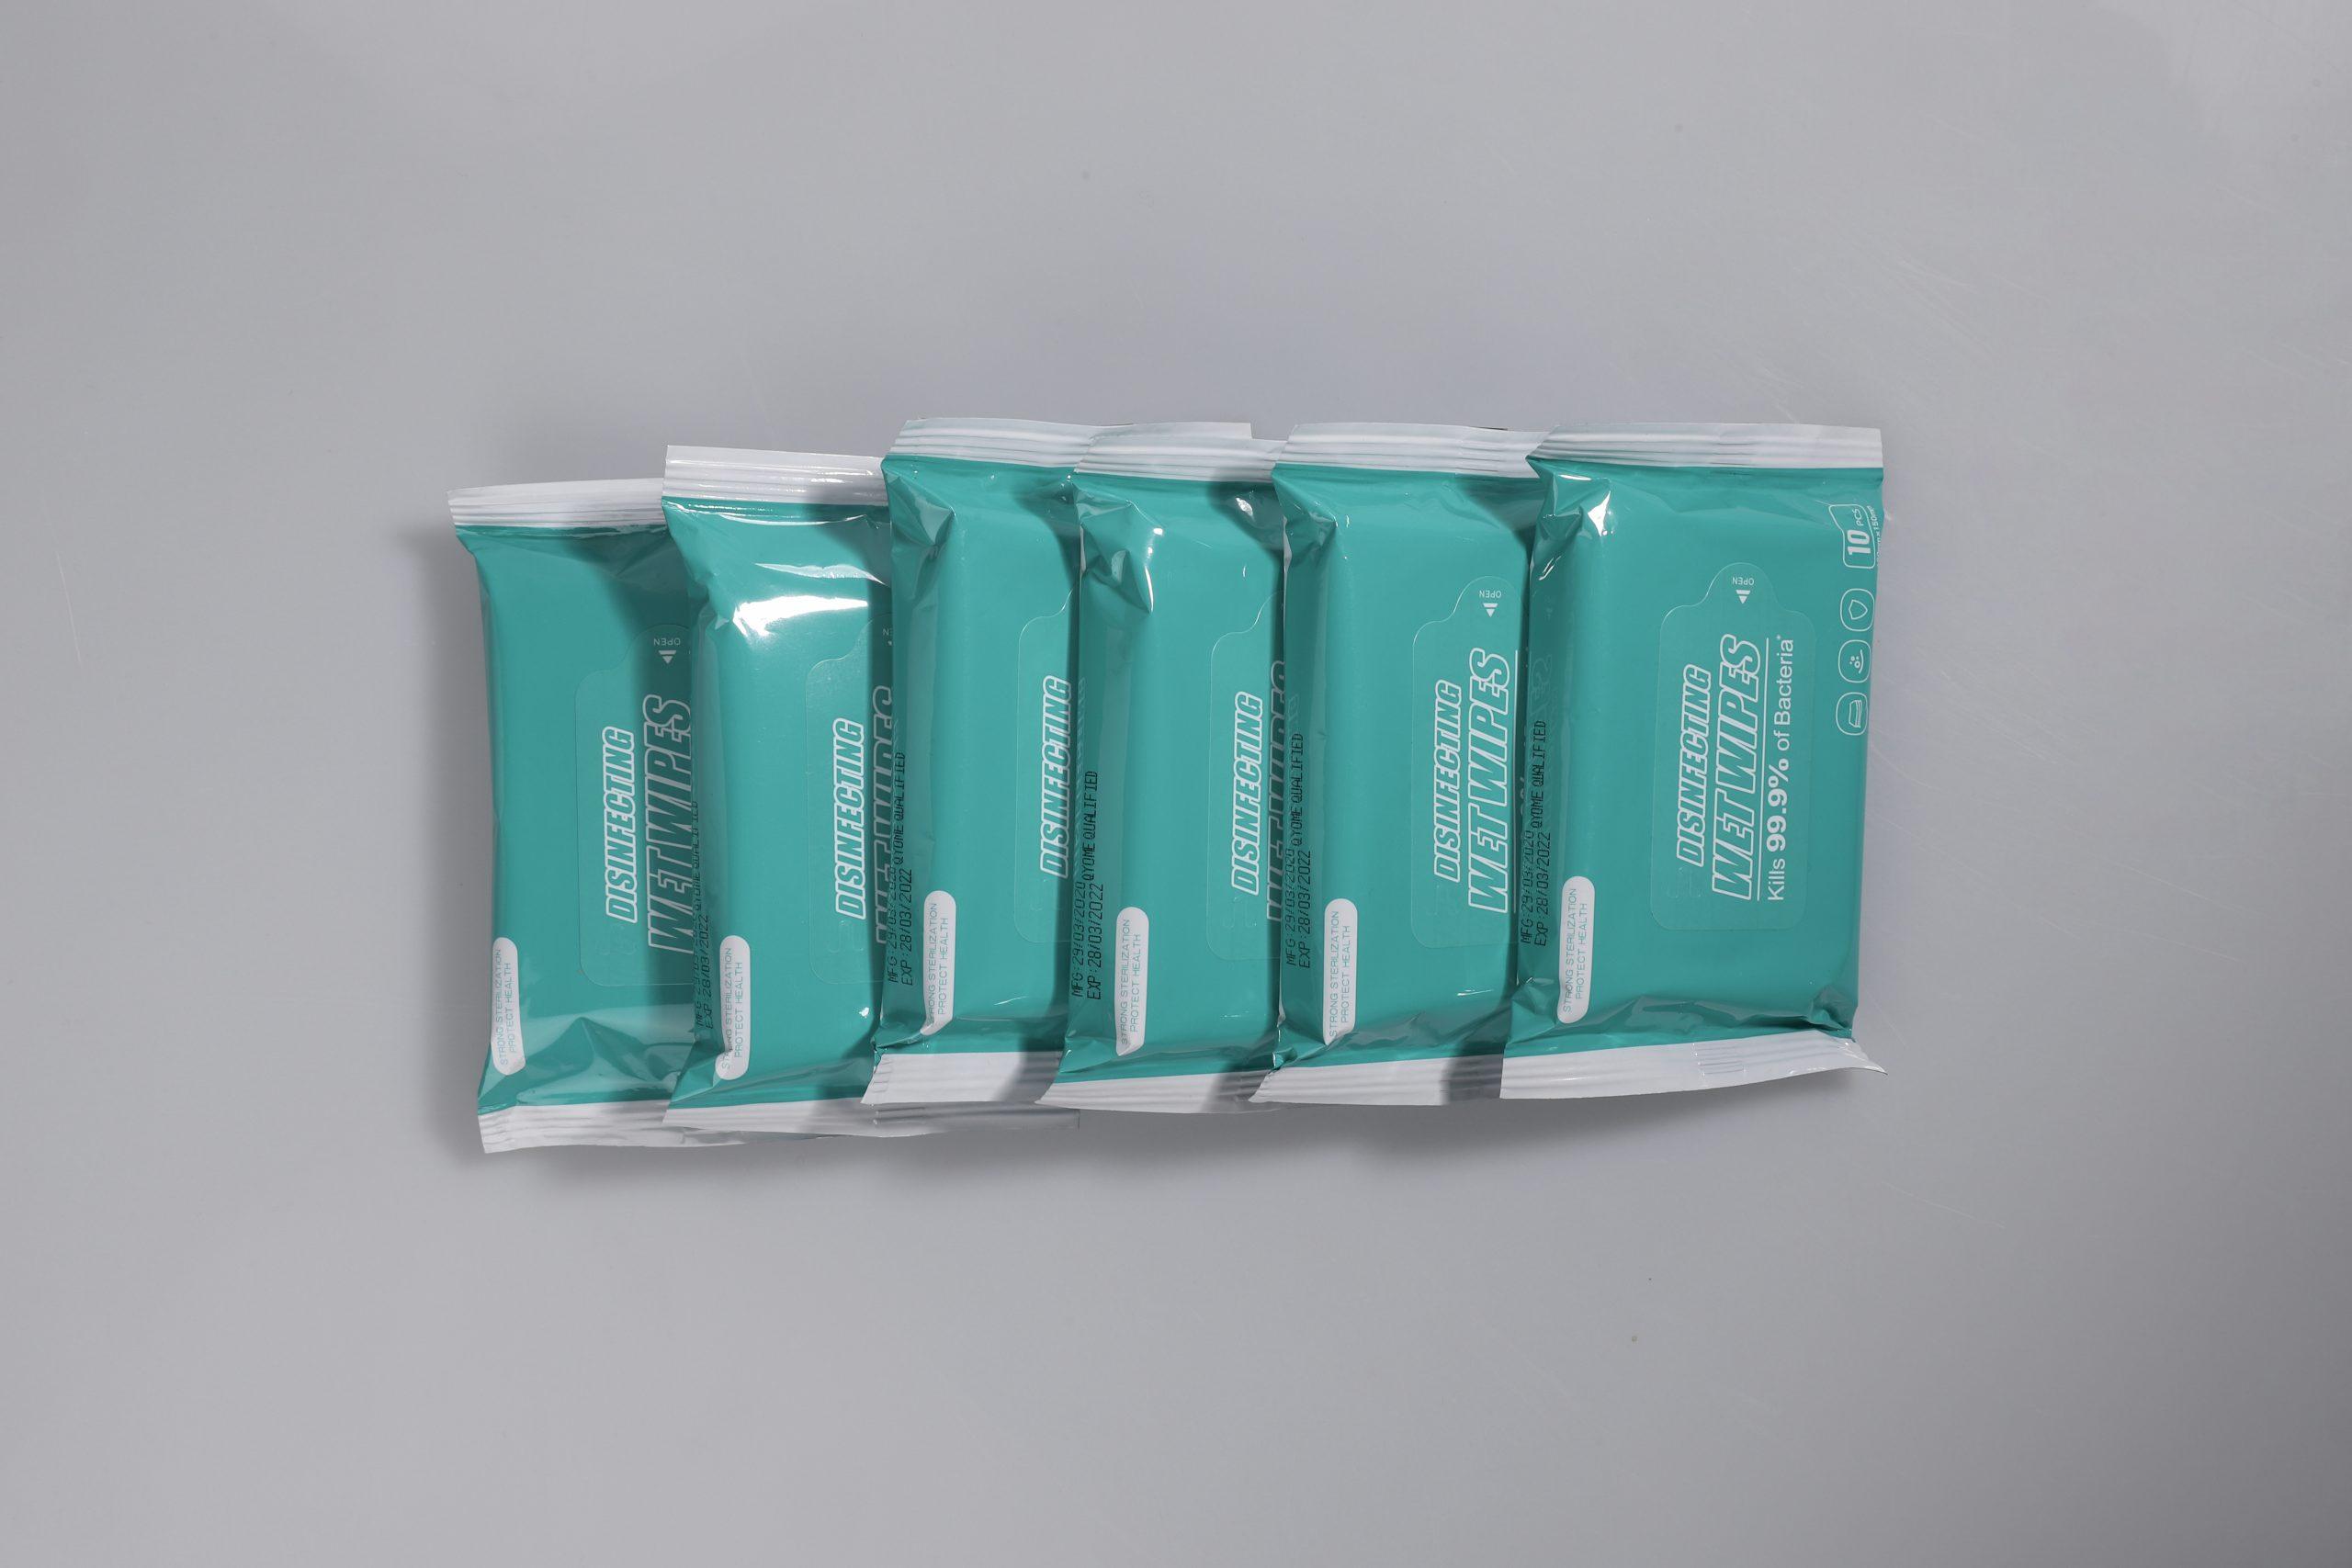 10pcs disinfectant wet wipes